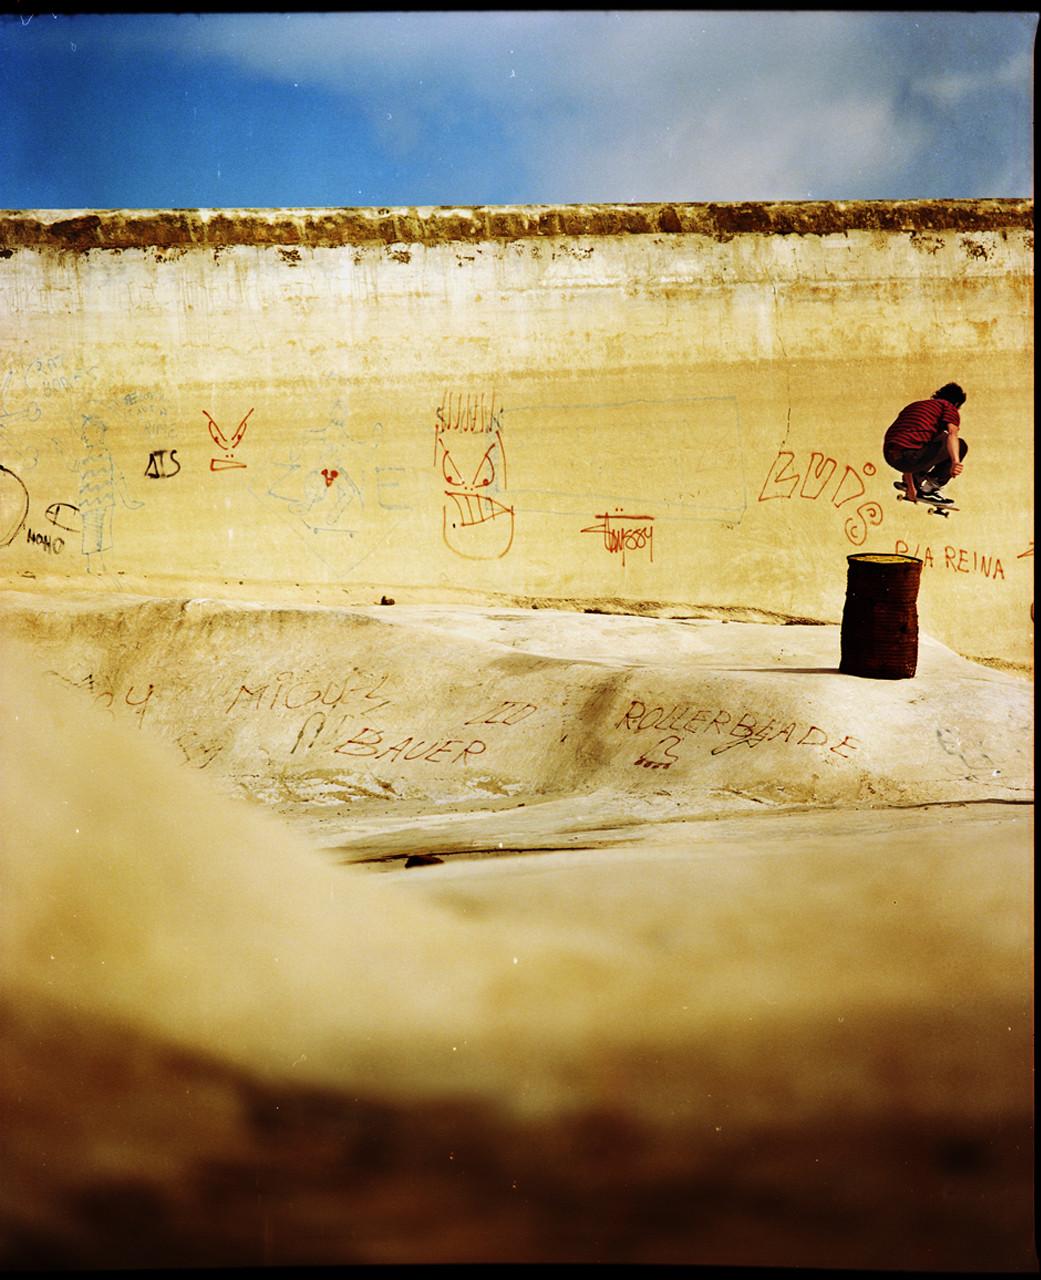 SKATE-STREET-PHOTOGRAPHY-28-JUANMI-MARQUEZ-1761x1280-1761x1280